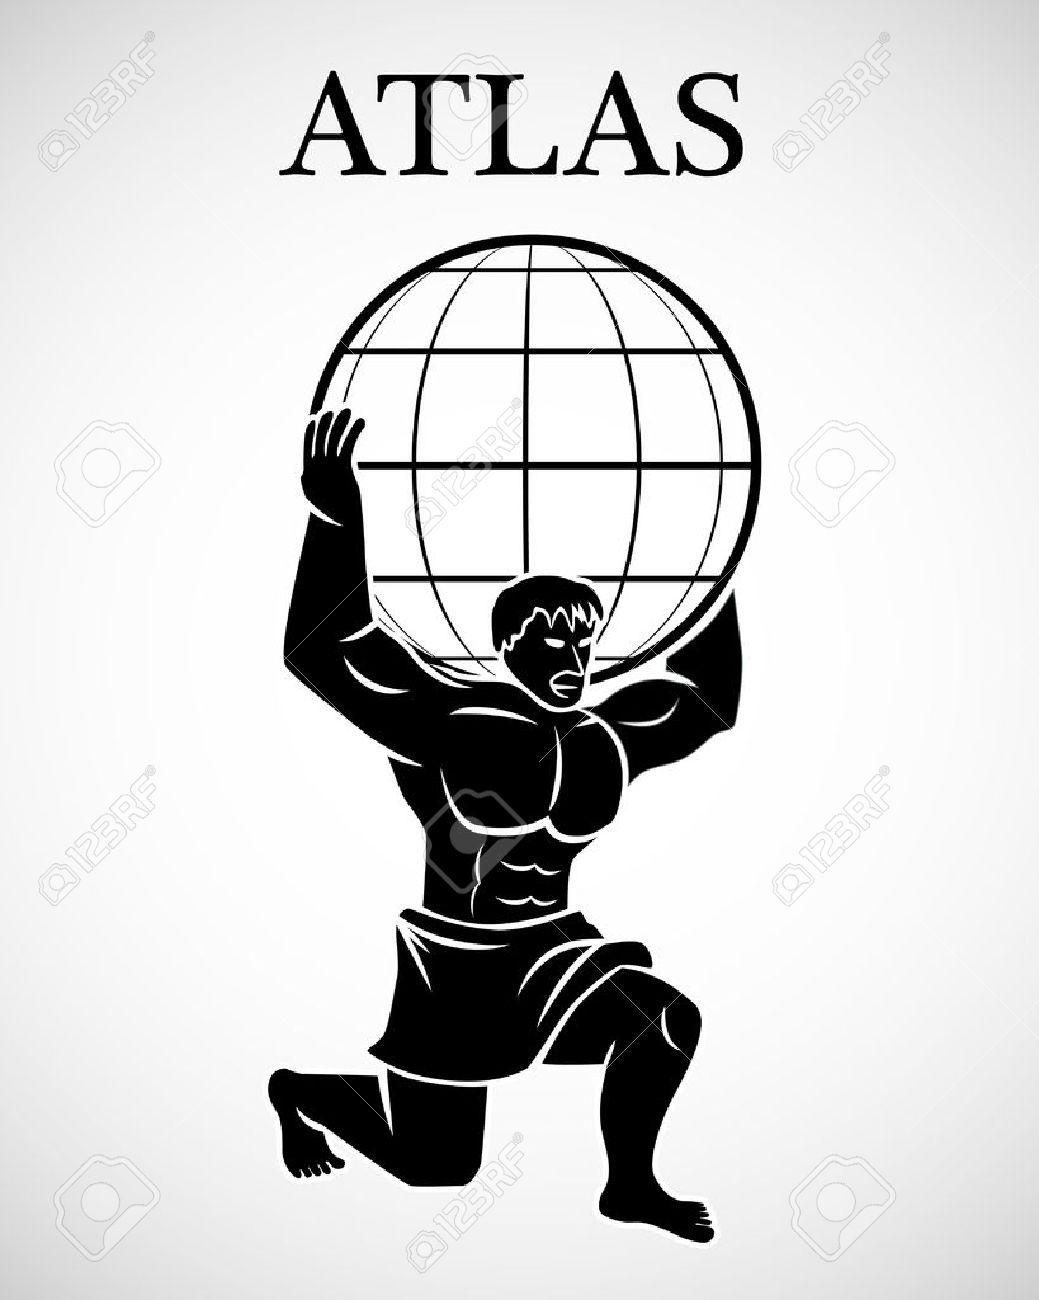 Greek god atlas clipart svg royalty free Stylized Atlas Royalty Free Cliparts, Vectors, And Stock ... svg royalty free